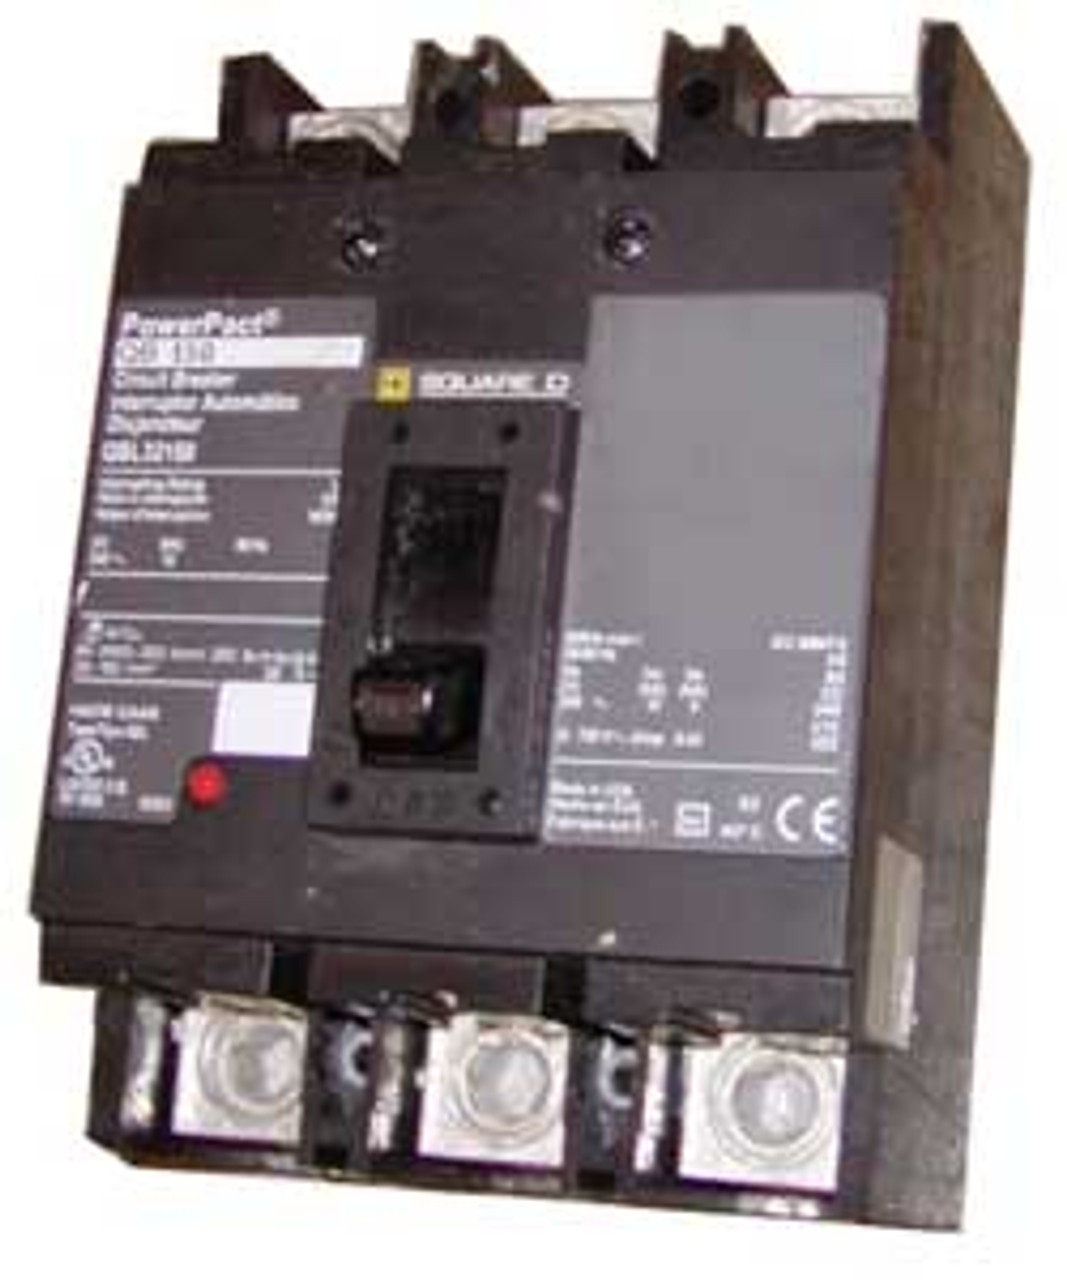 Square D QBL32200 3 Pole 200 Amp 240VAC Circuit Breaker - Used